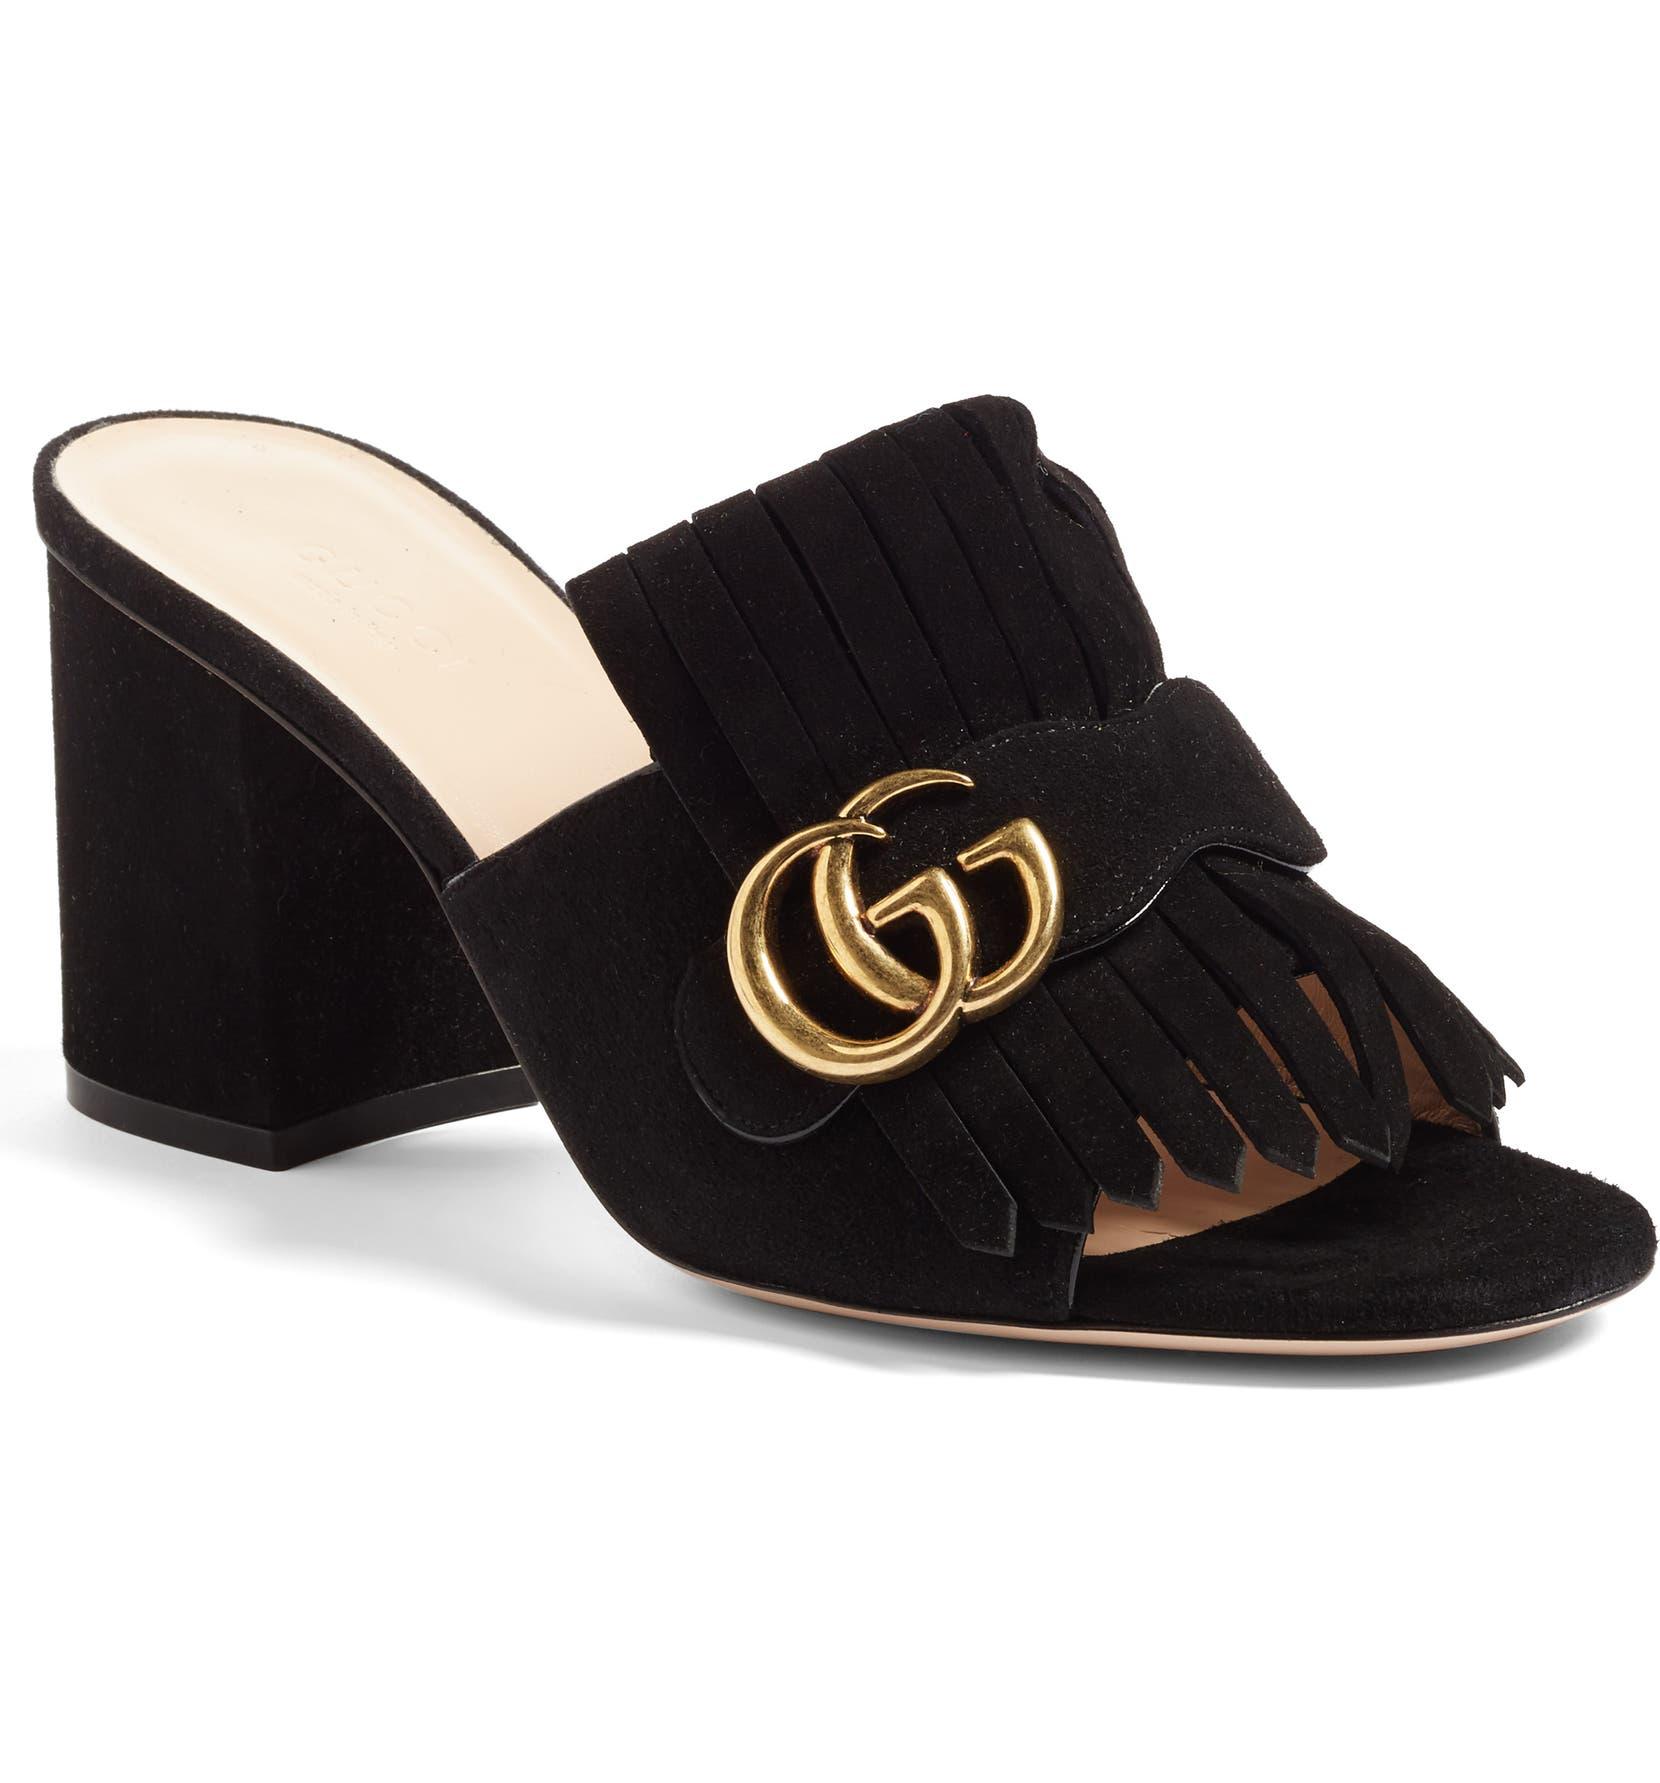 c0fe28906 Gucci GG Marmont Peep Toe Mule (Women)   Nordstrom